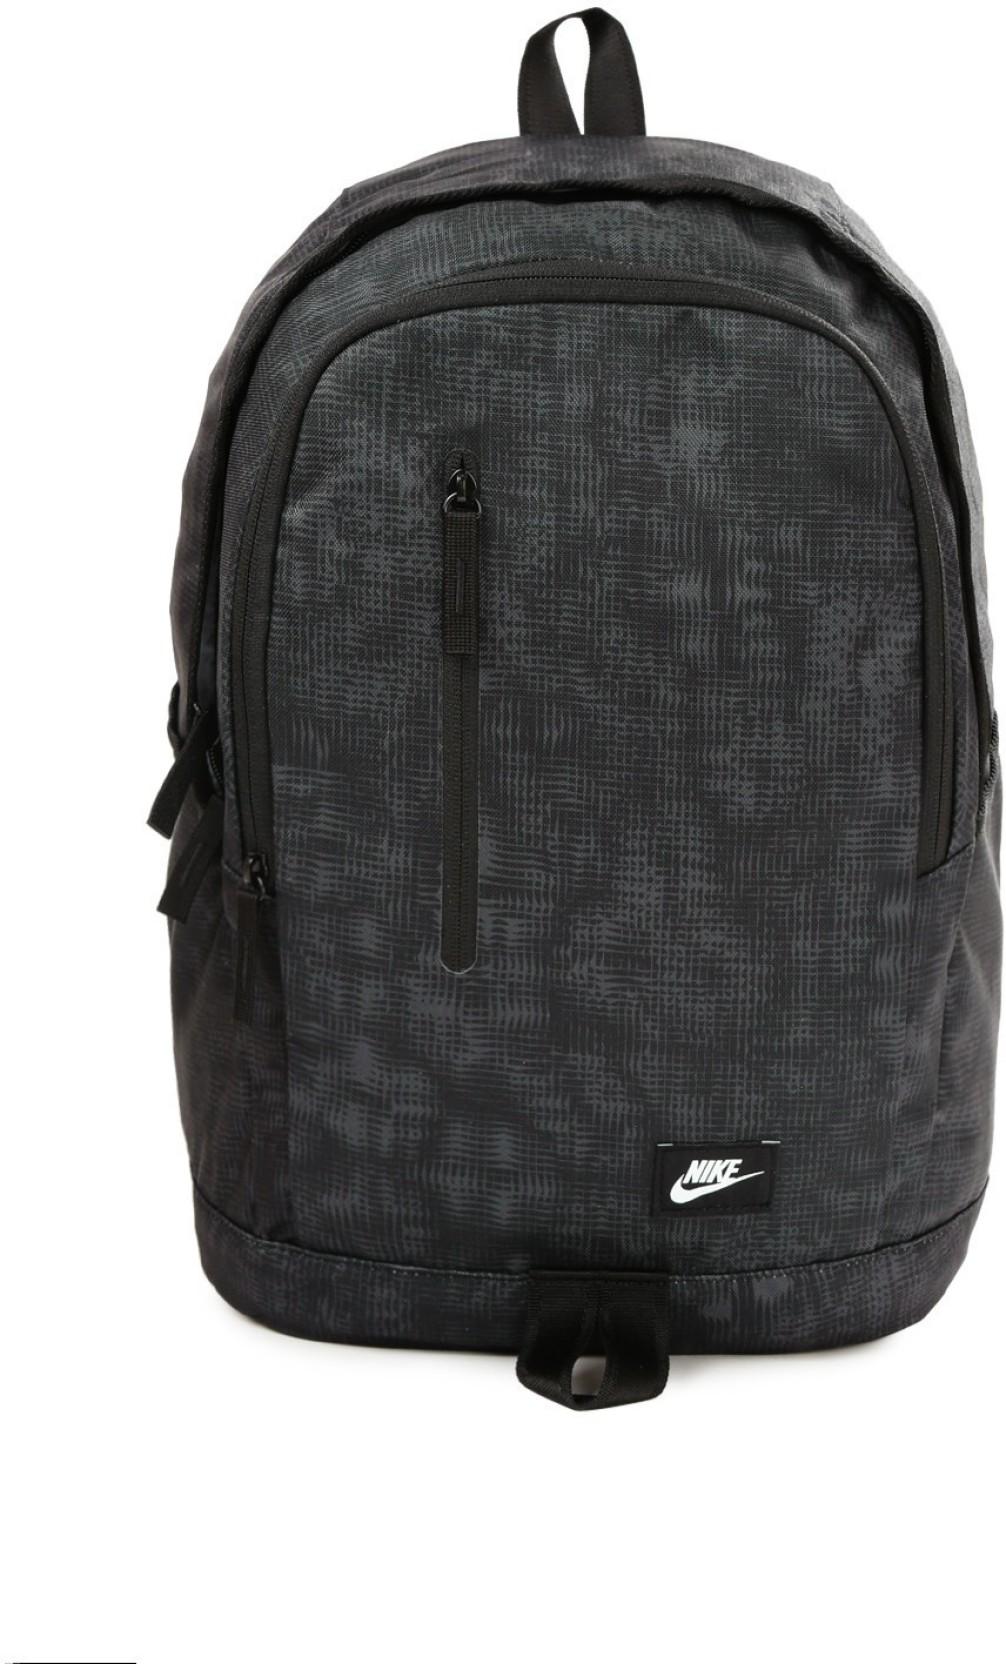 Nike All Access Soleday 25 L Backpack (Black) 69ee09b69bab5